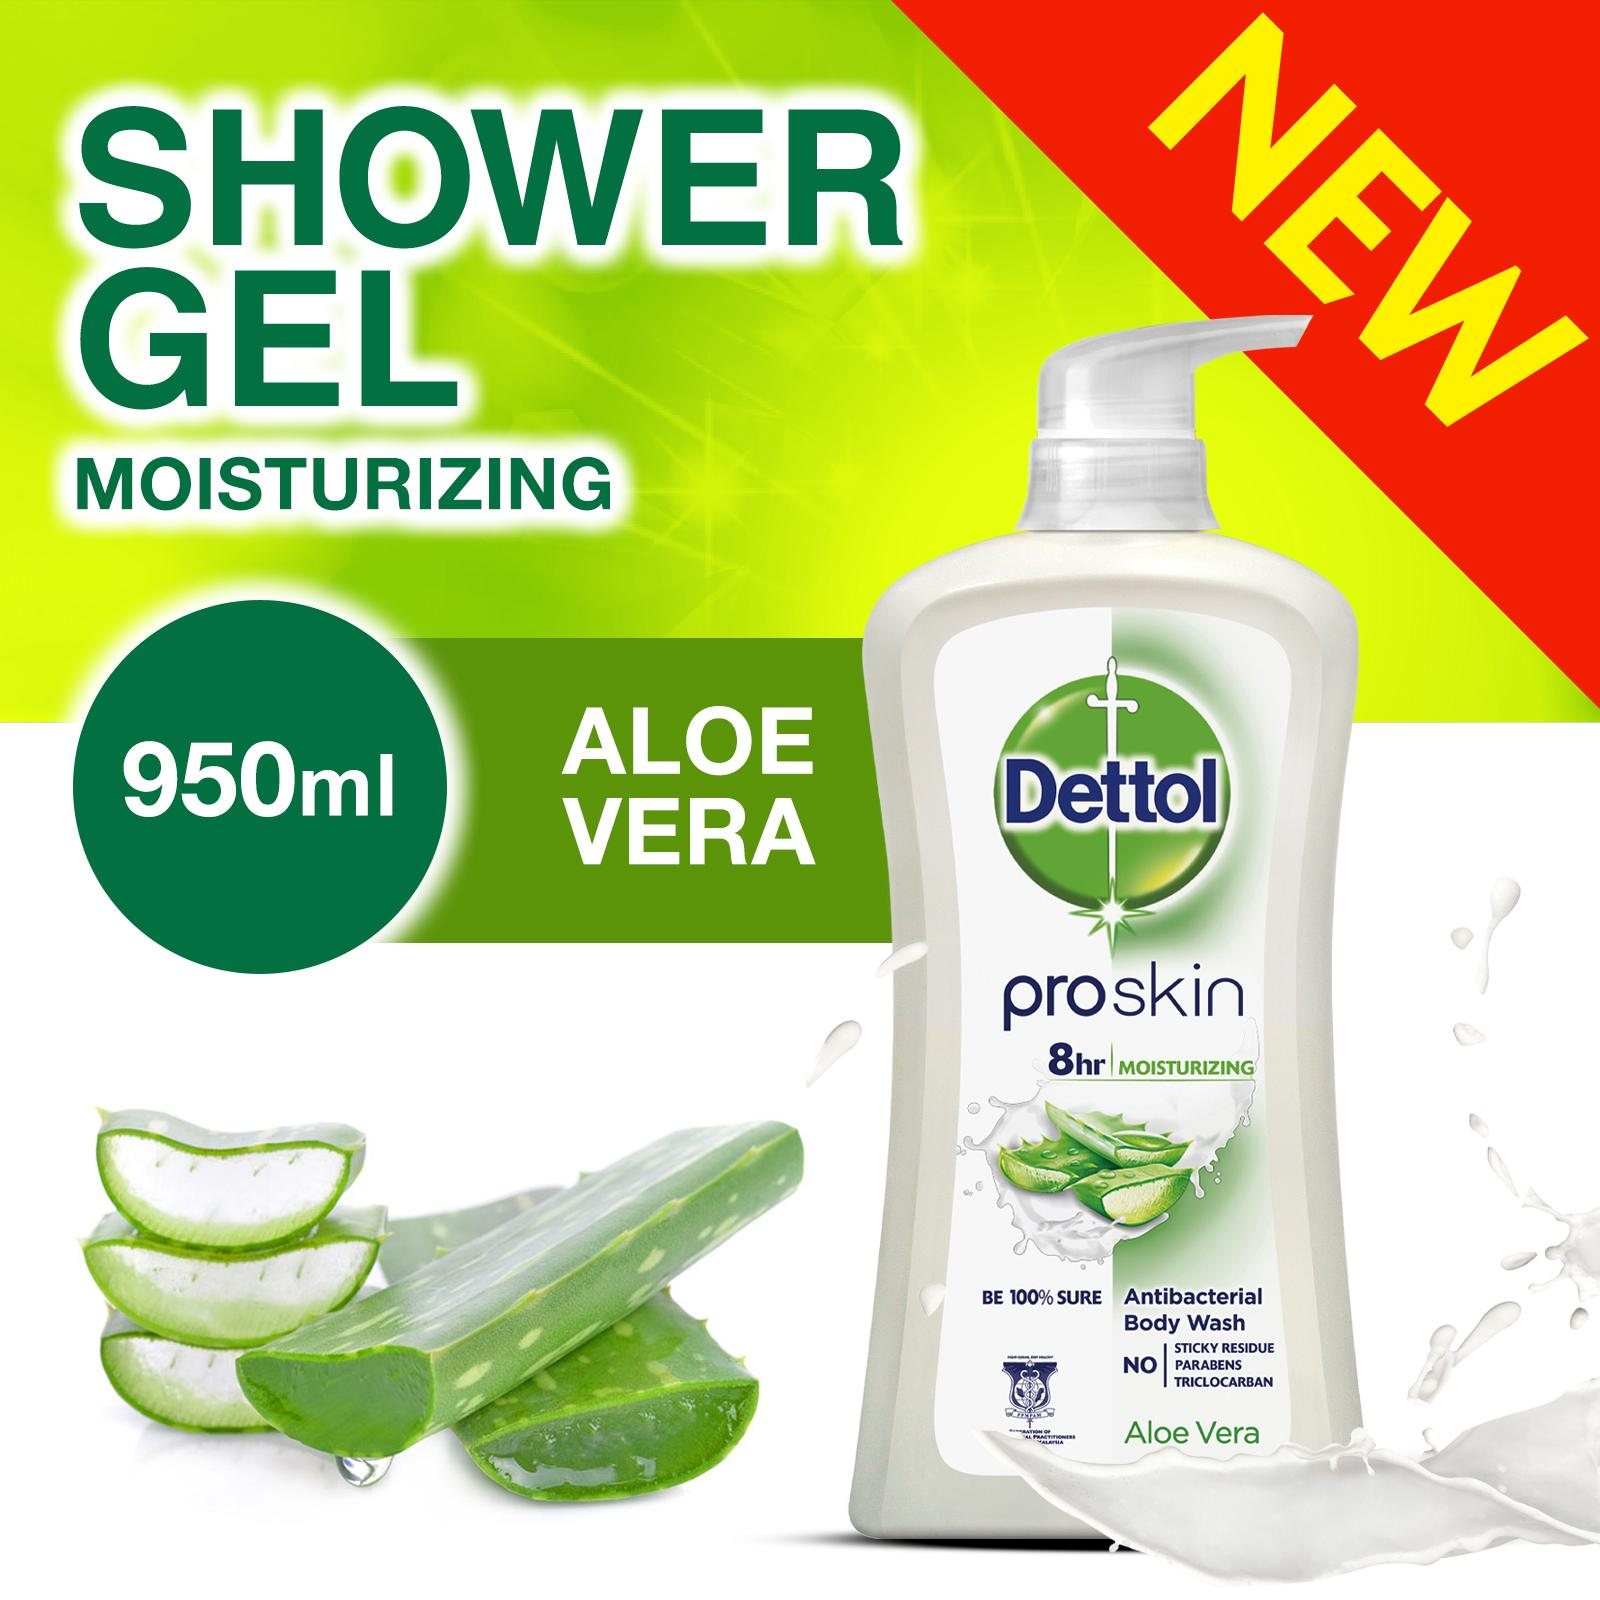 Dettol Pro Skin Aloe Vera 950ml By Dettol.